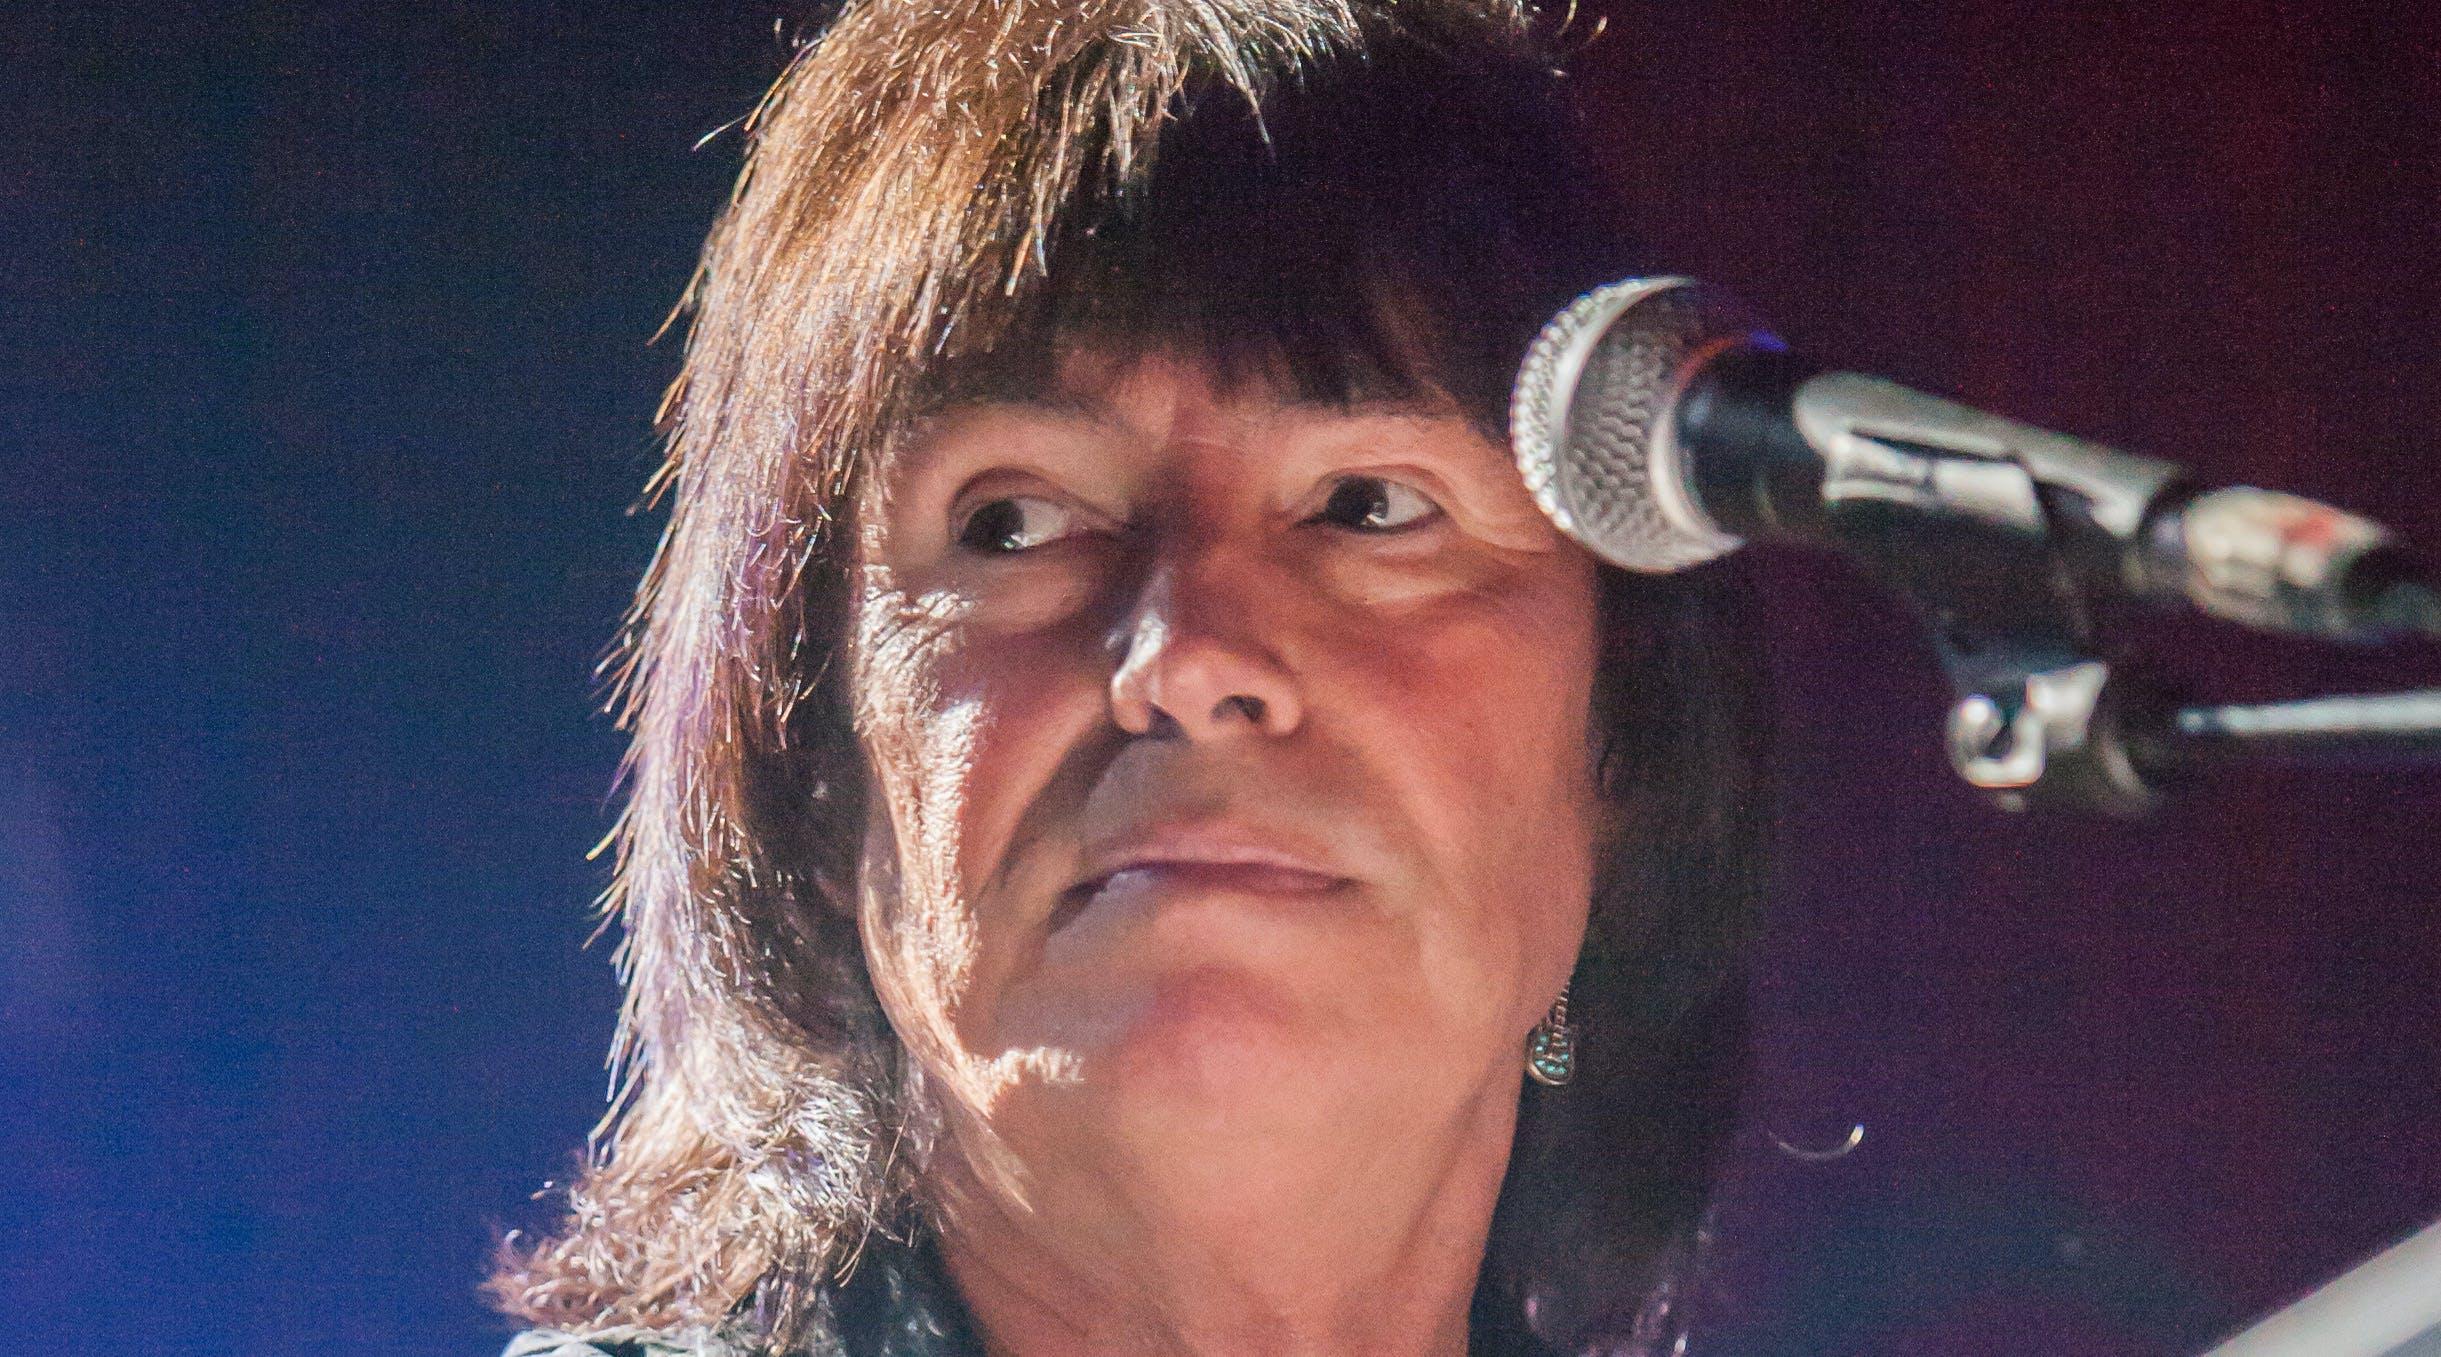 UFO Guitarist And Keyboardist Paul Raymond Dead At 73